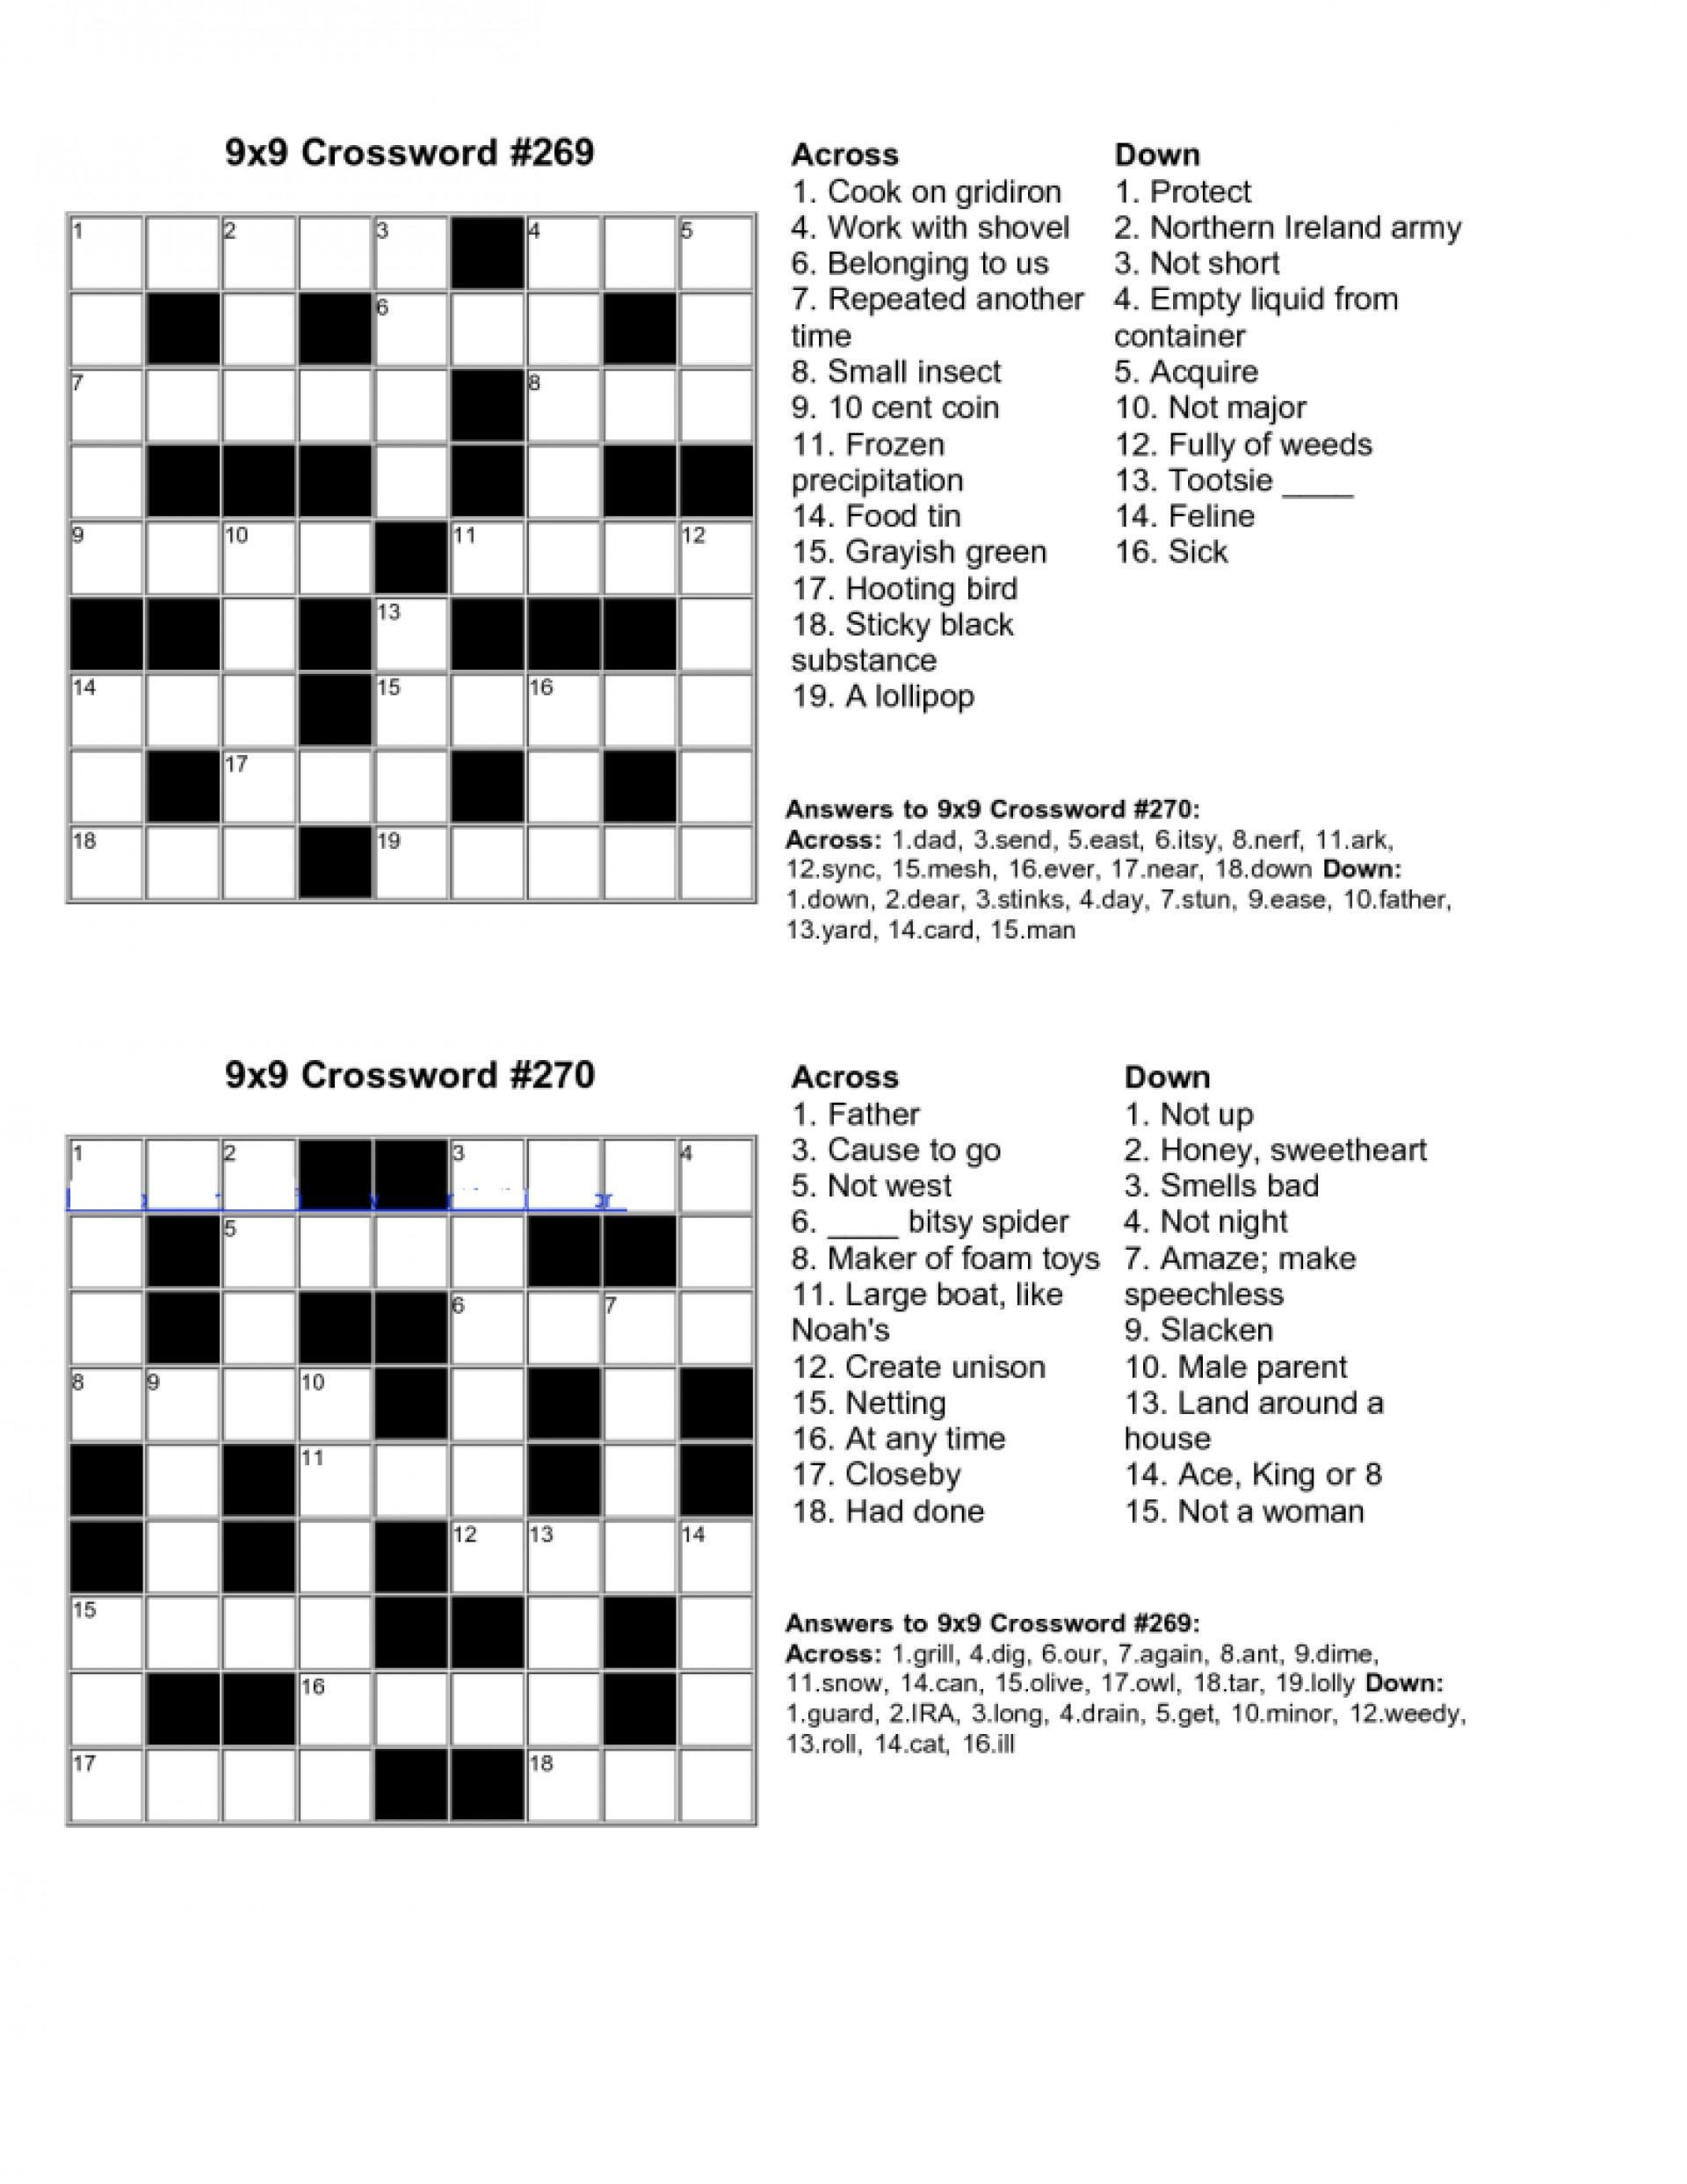 Free Crossword Puzzle Maker Printable - Stepindance.fr - Crossword Maker Free And Printable